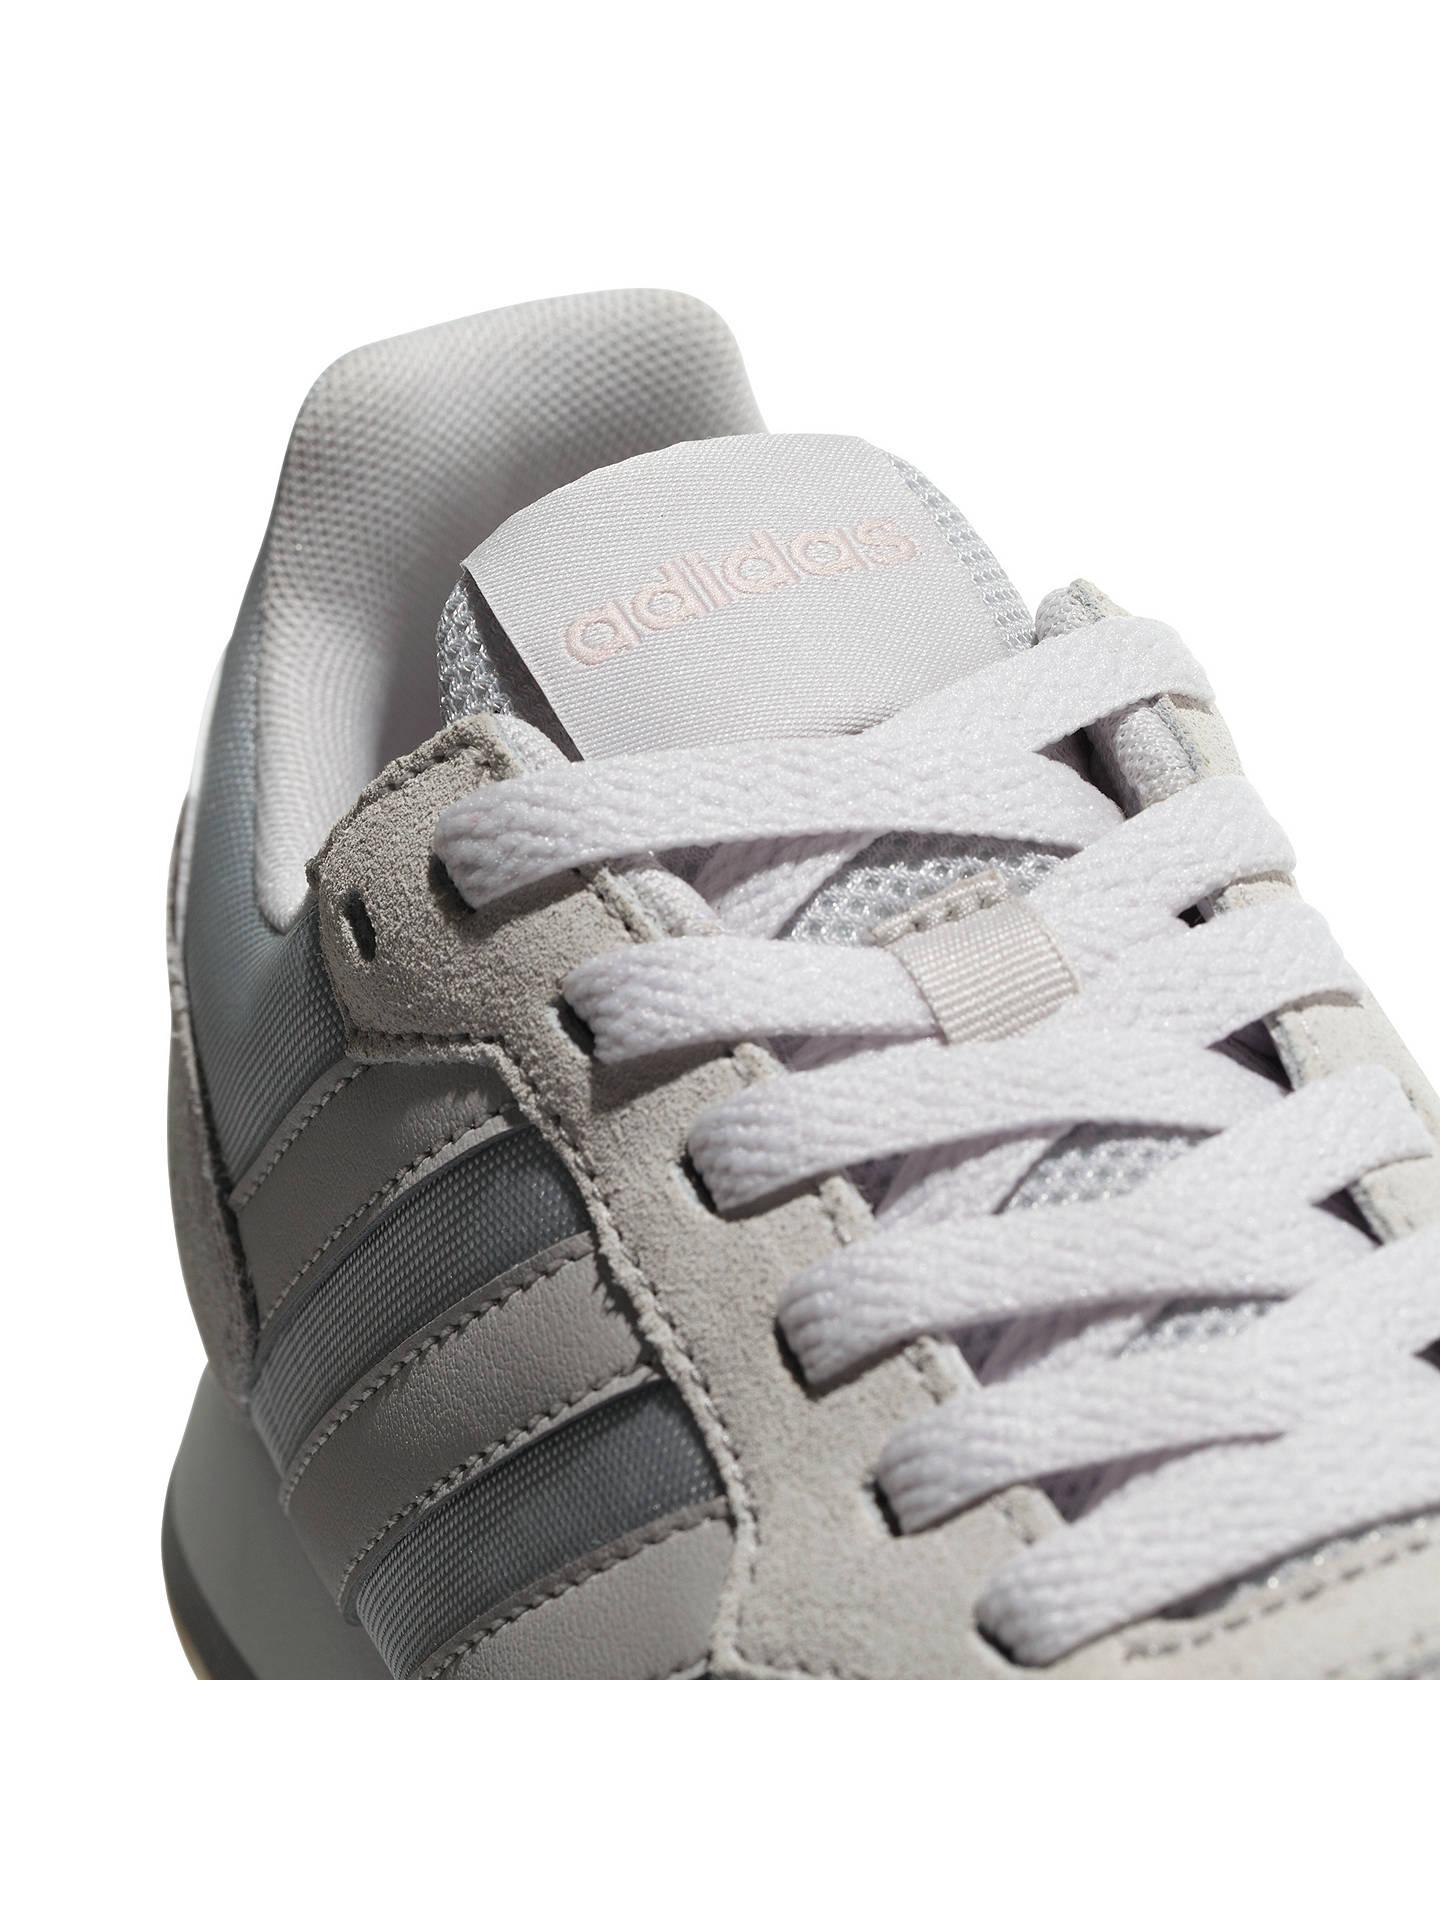 adidas 8k neo